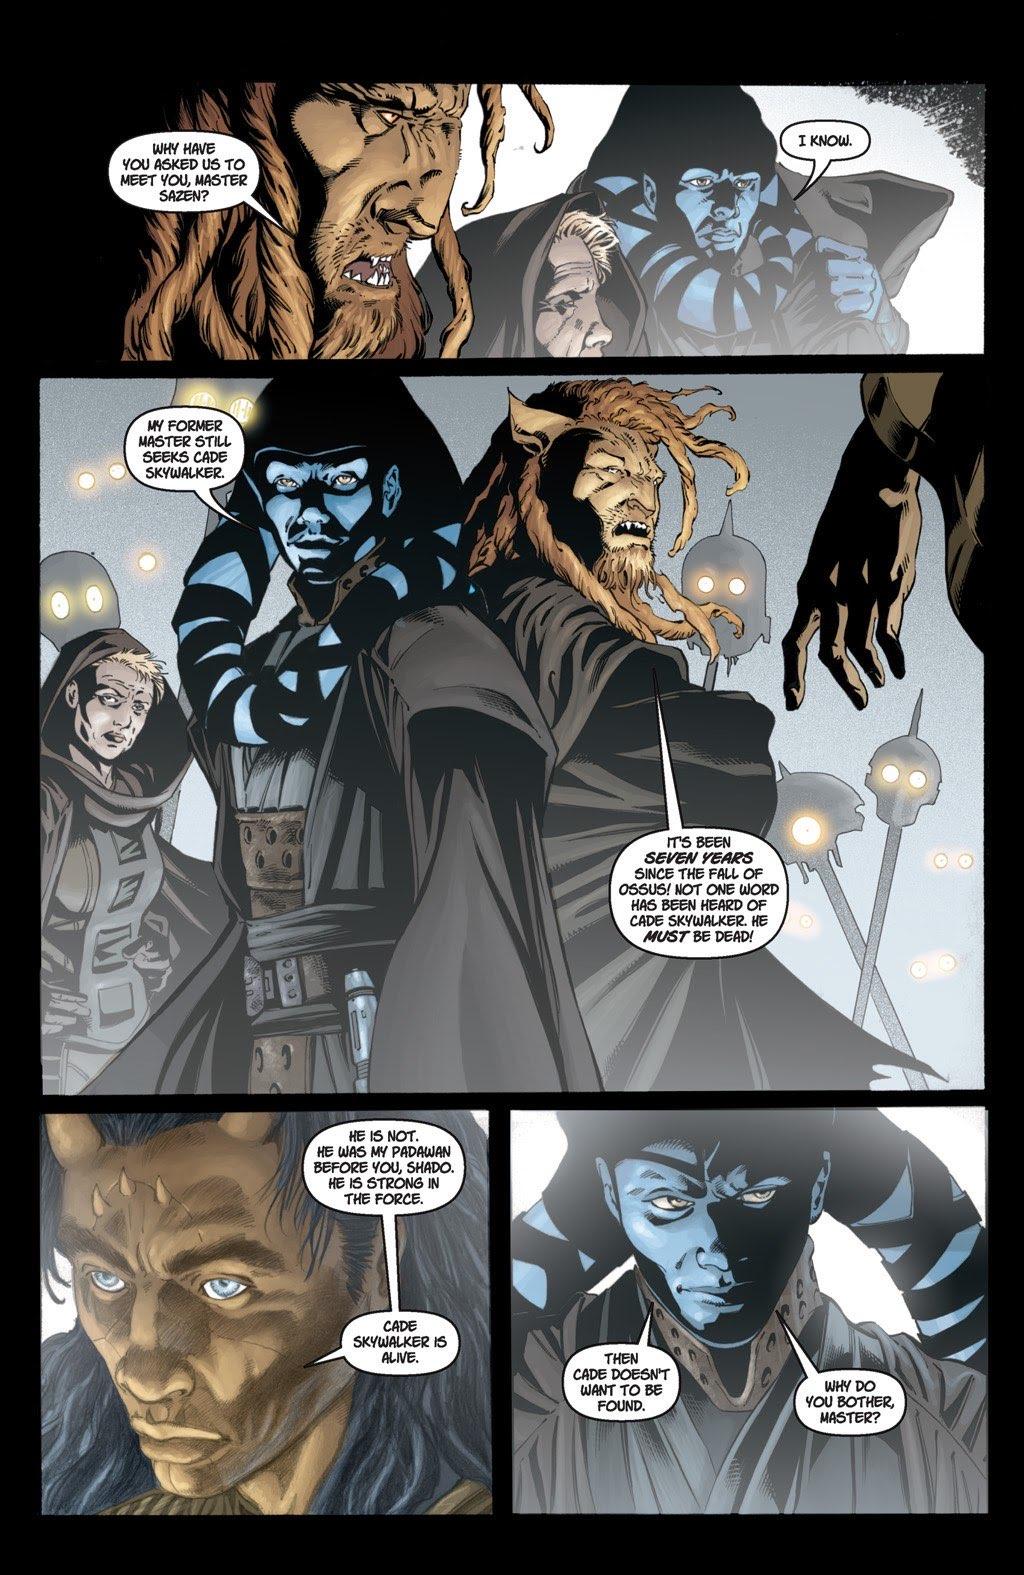 Stomper Showdown R2 #8 - Antares Draco (Informal Geek) vs TUF! Jacen Solo (RNGesus4) A63c4010